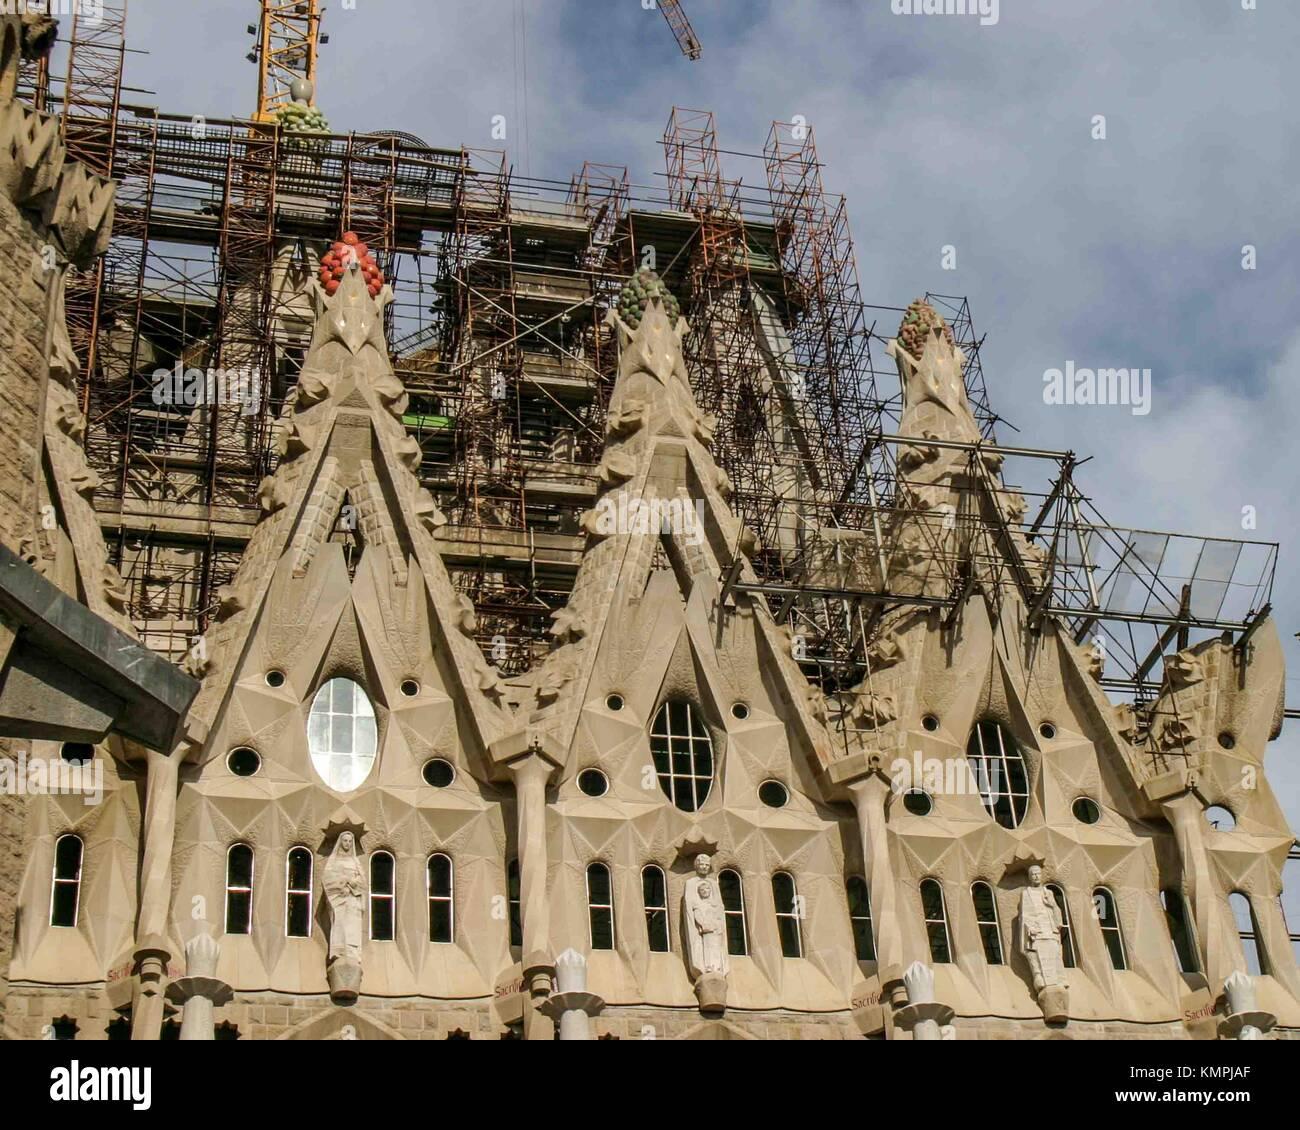 Barcelona, Catalonia, Spain. 19th Oct, 2004. The celebrated unfinished Sagrada Familia (Sacred Family) Basilica - Stock Image